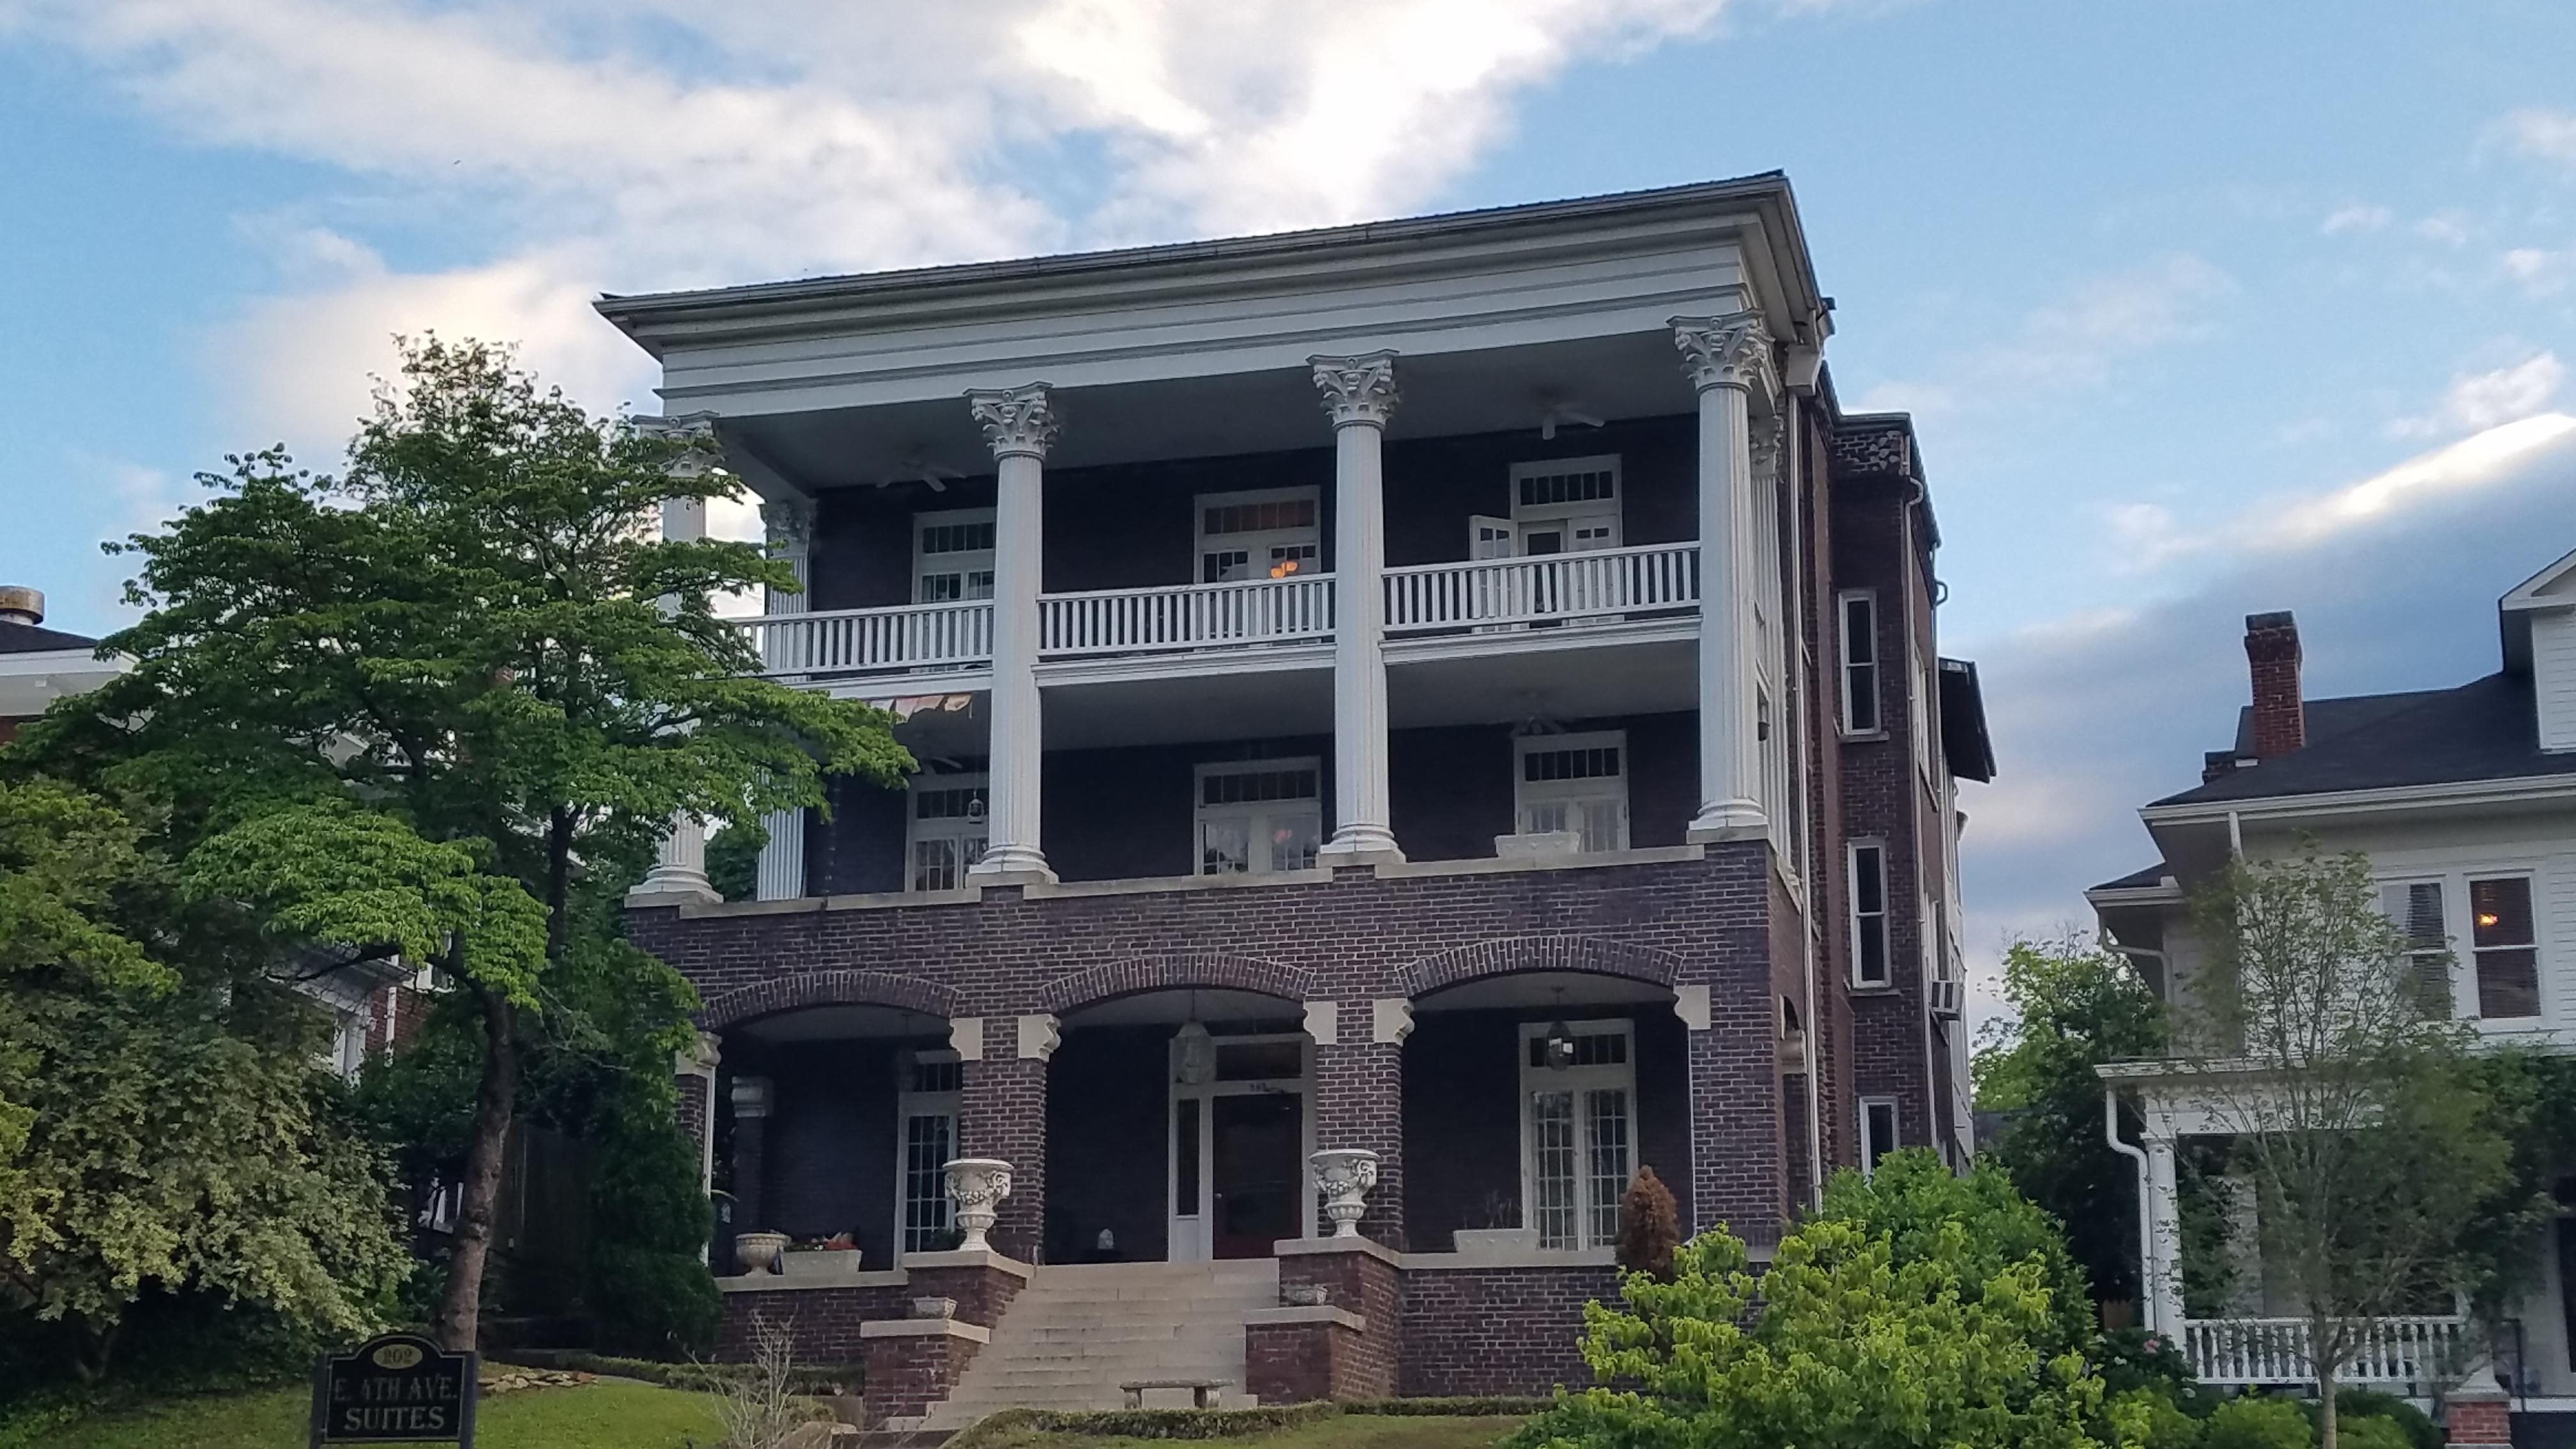 Greek Revival Historic Home